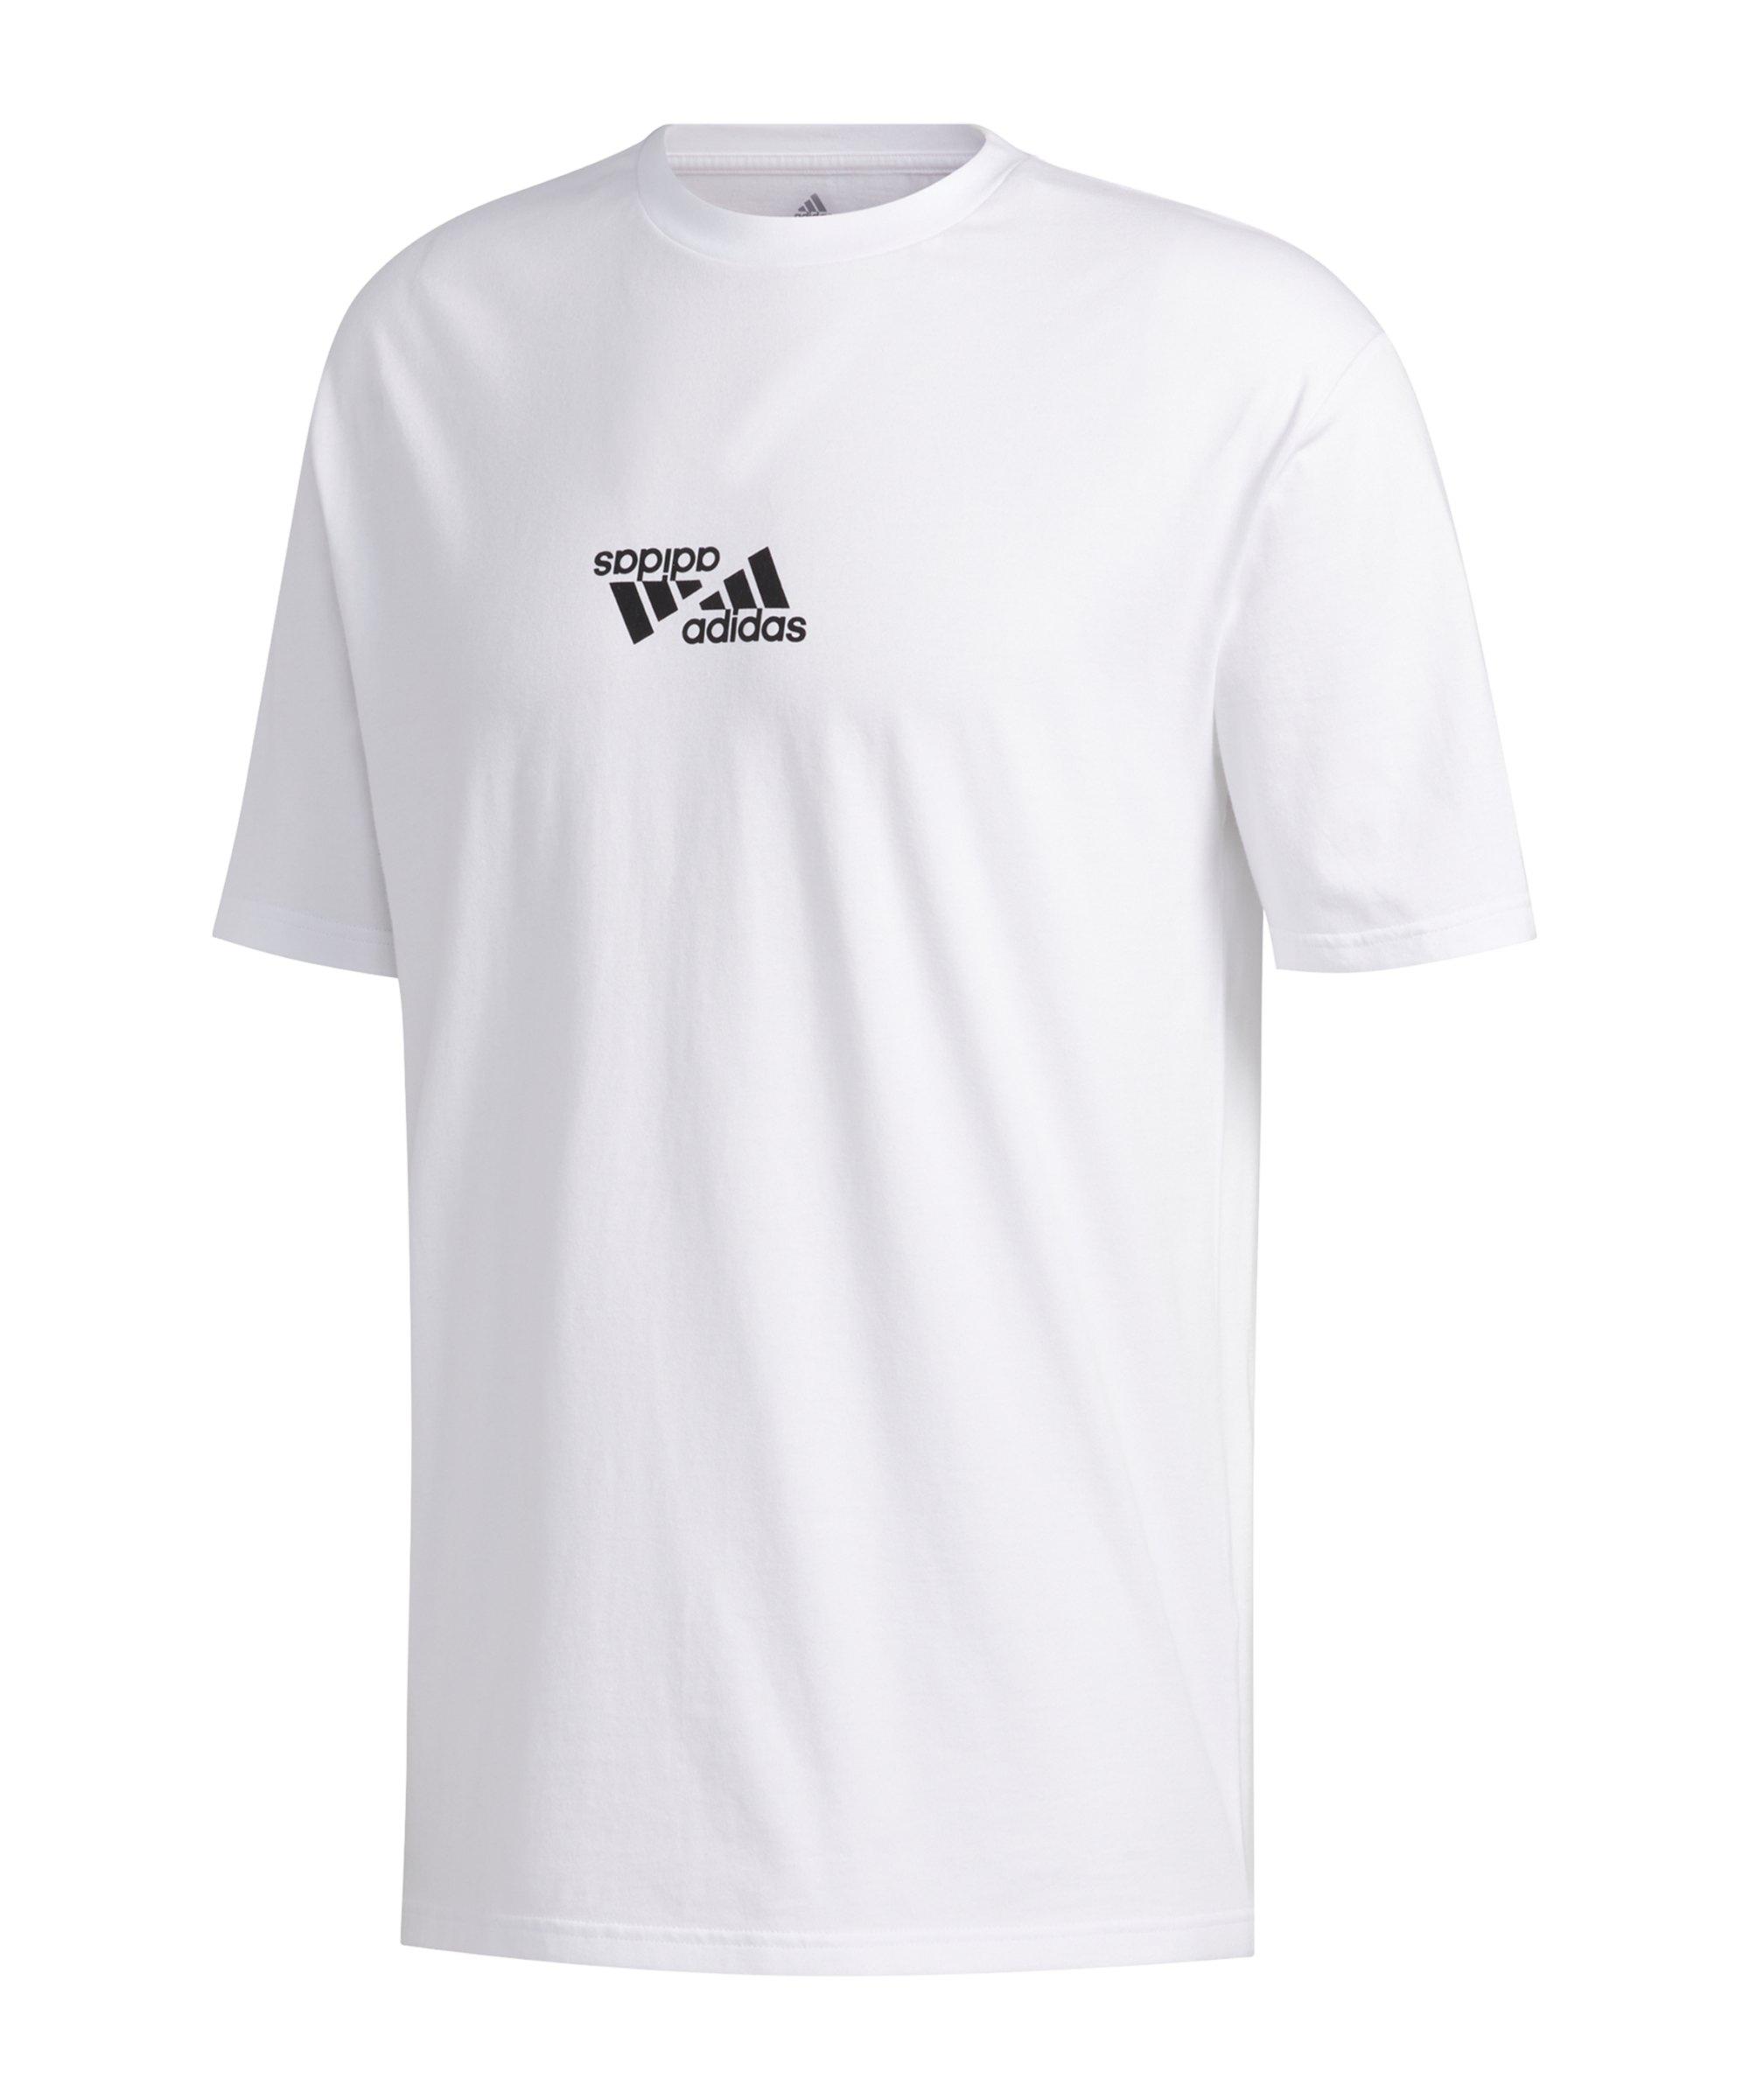 adidas One Team Graphic T-Shirt Weiss - weiss